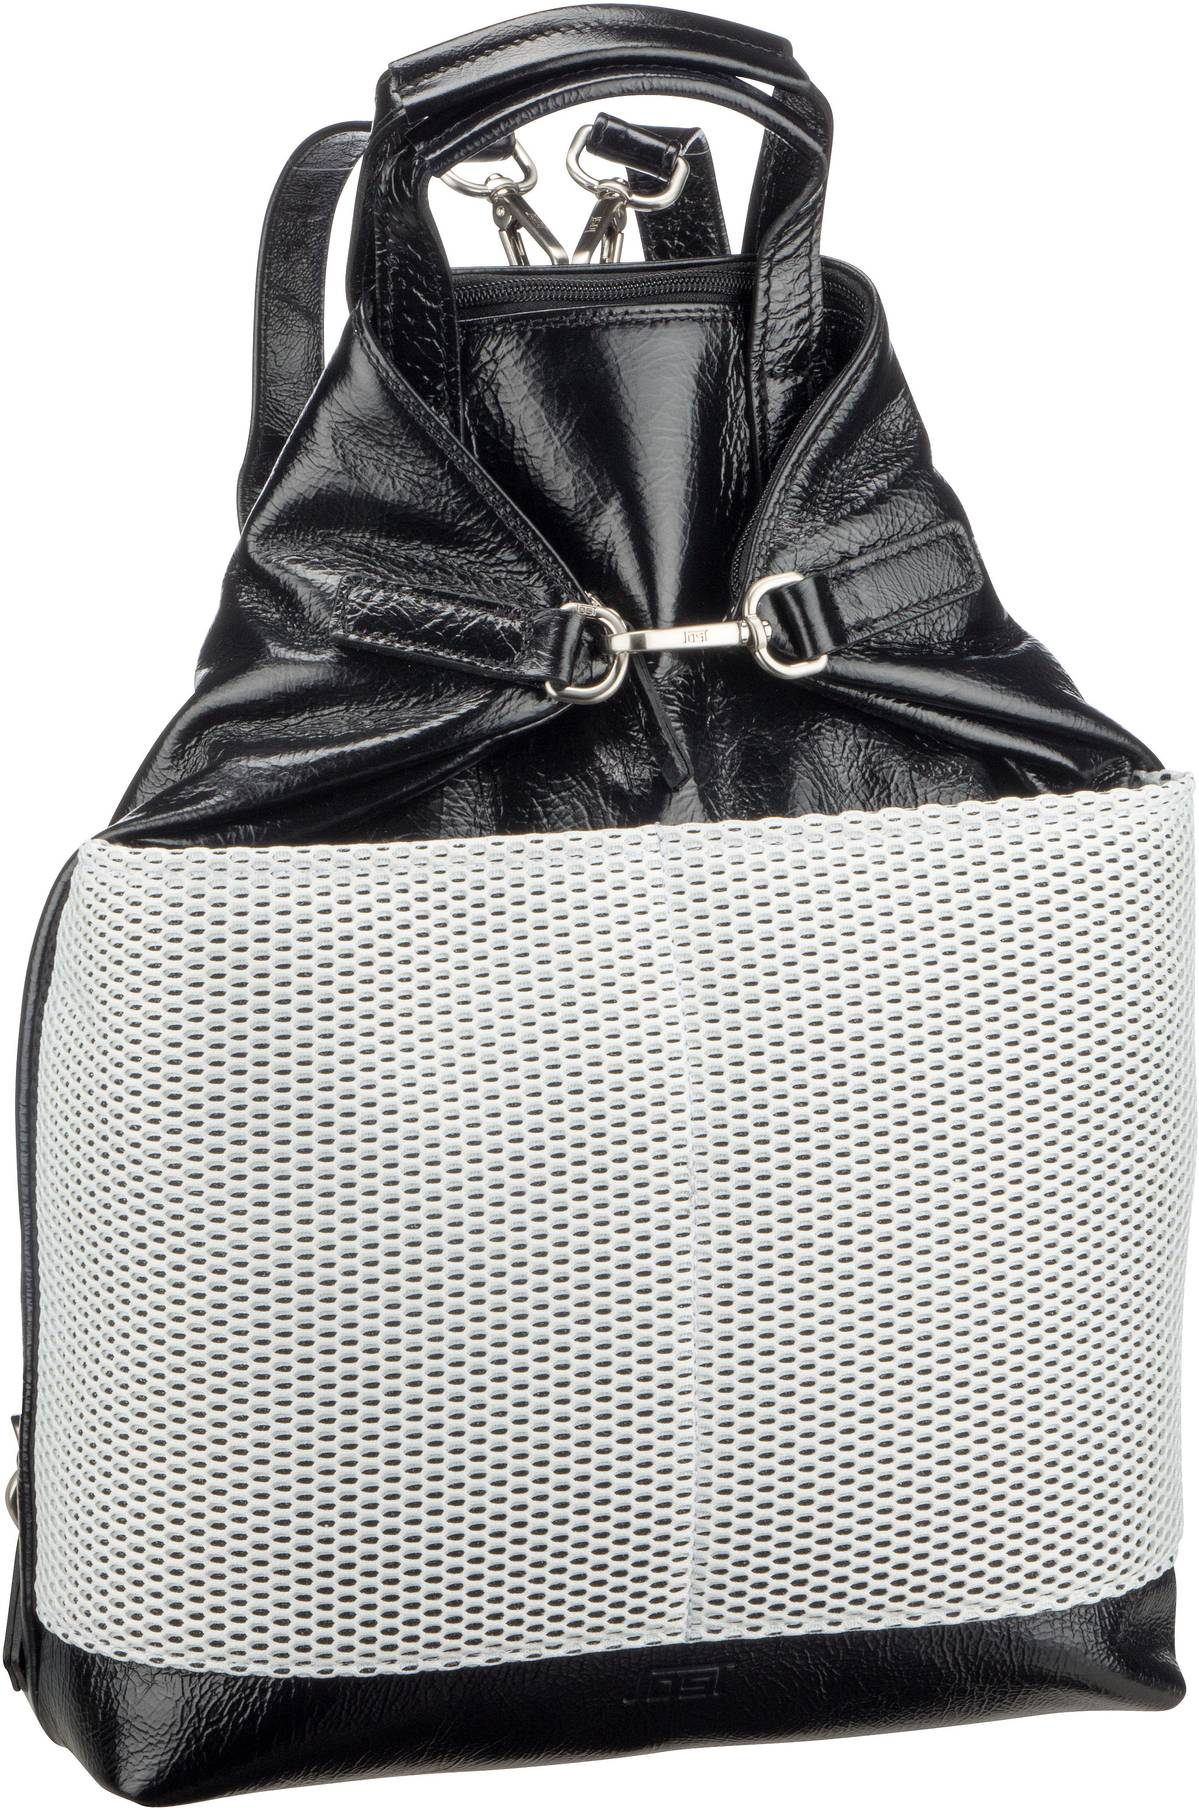 Rucksack / Daypack Black & White 3182 X-Change 3in1 Bag S Black